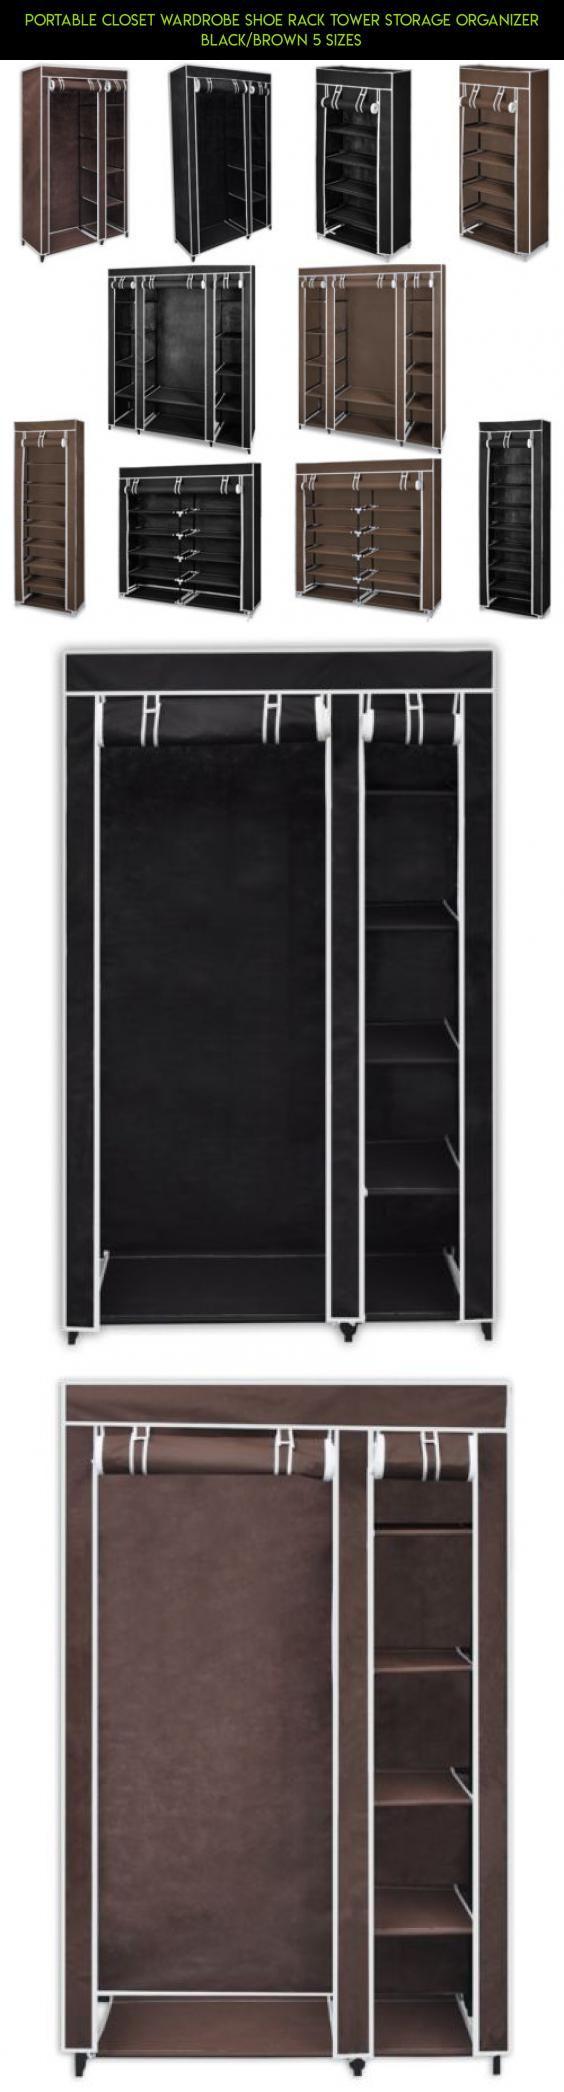 Portable wardrobe on wheels - Portable Closet Wardrobe Shoe Rack Tower Storage Organizer Black Brown 5 Sizes Camera